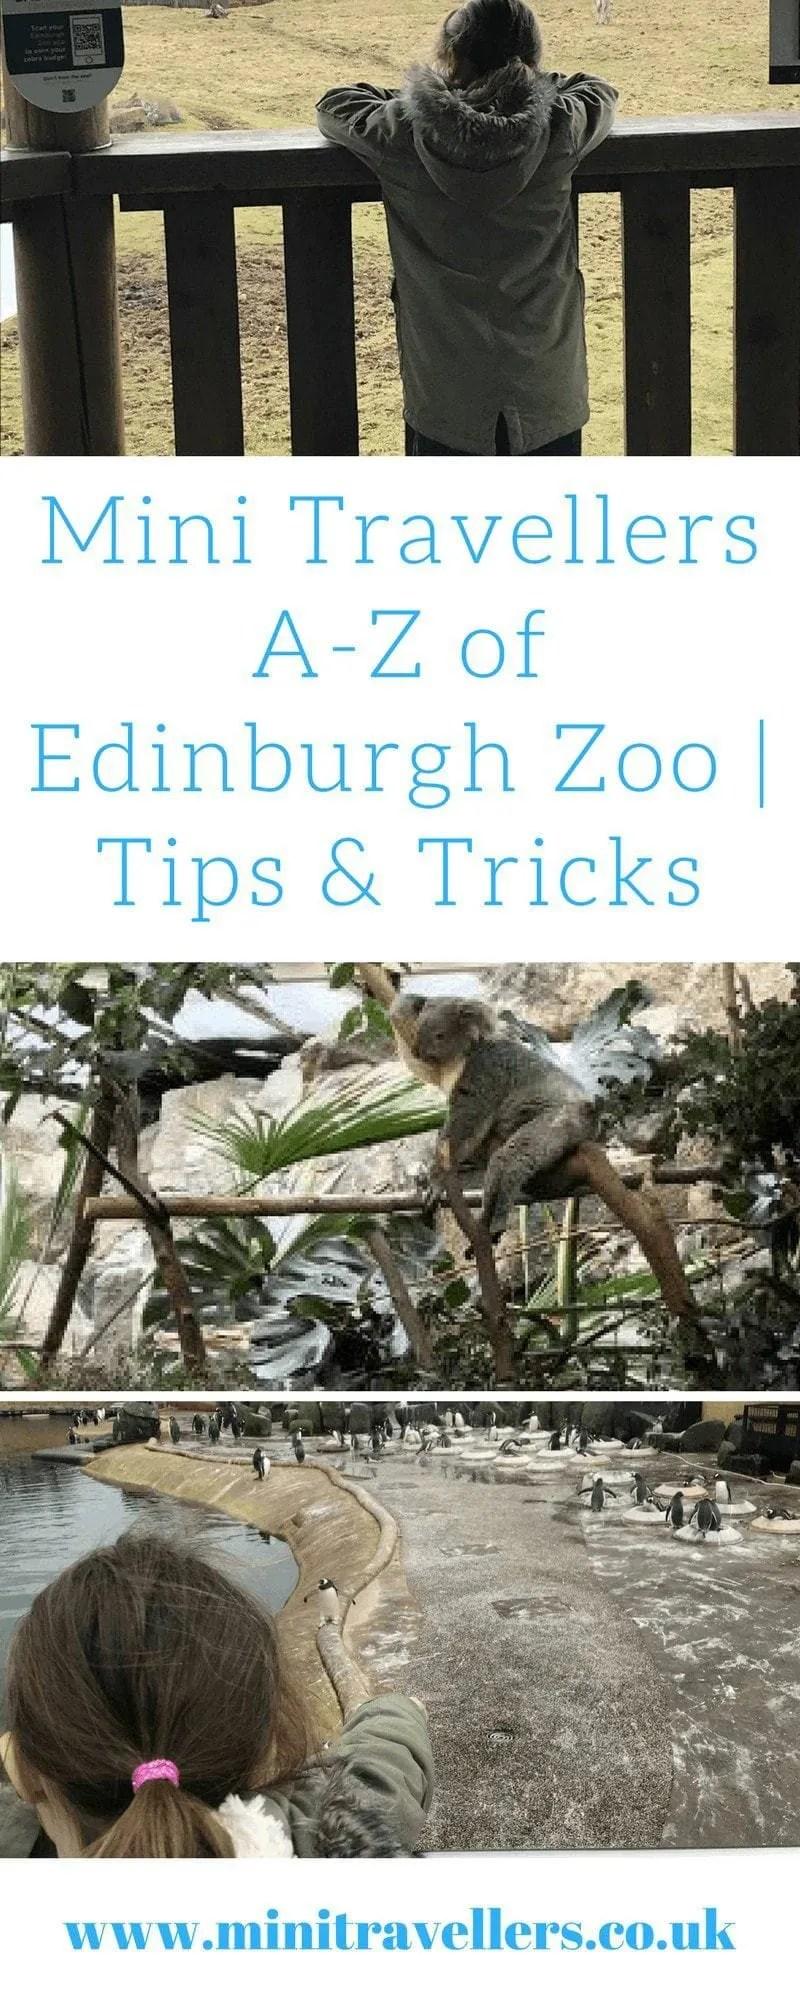 Mini Travellers A-Z of Edinburgh Zoo _ Tips & Tricks